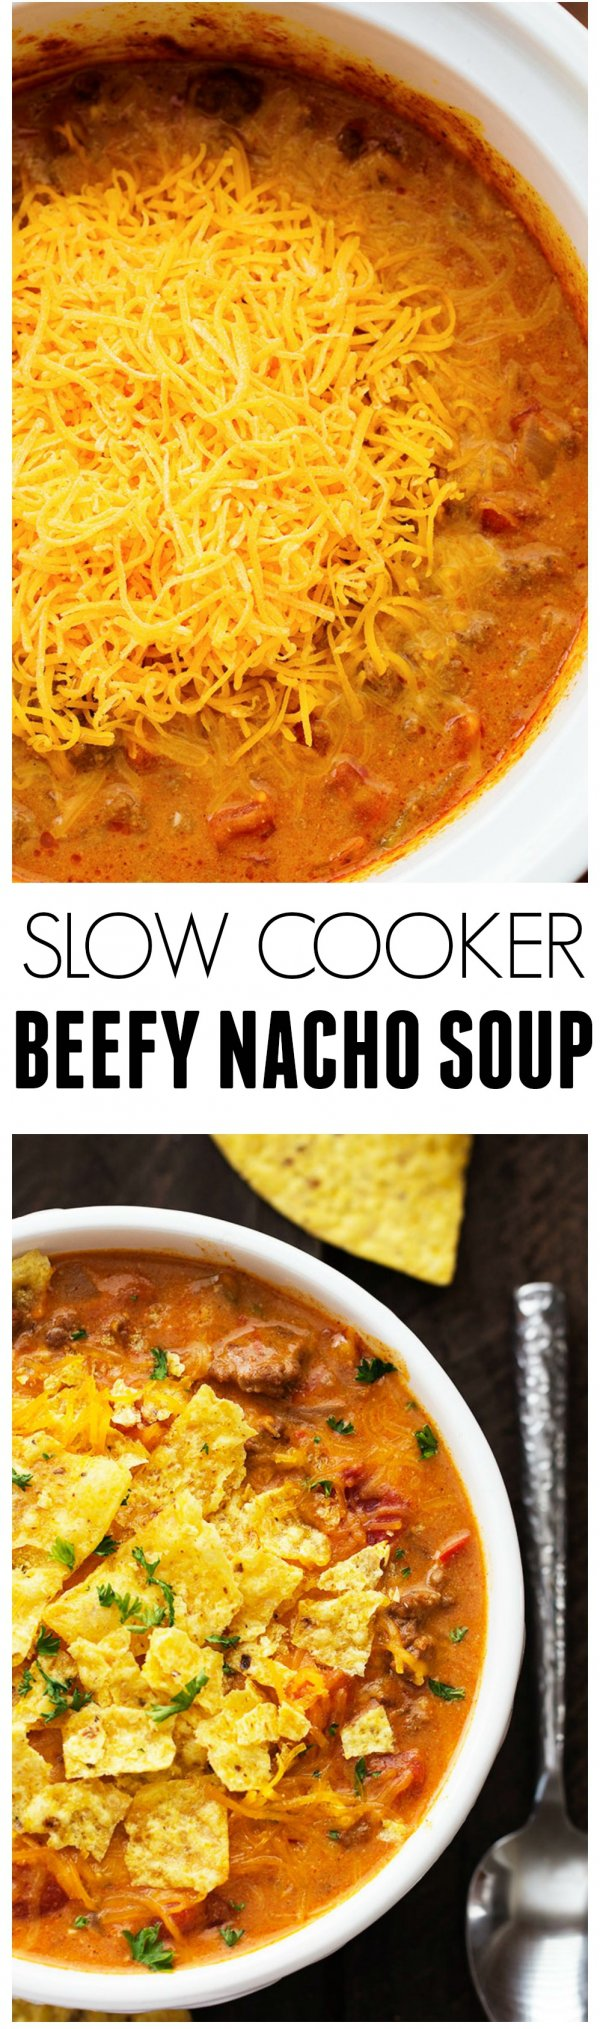 dish,food,curry,cuisine,produce,